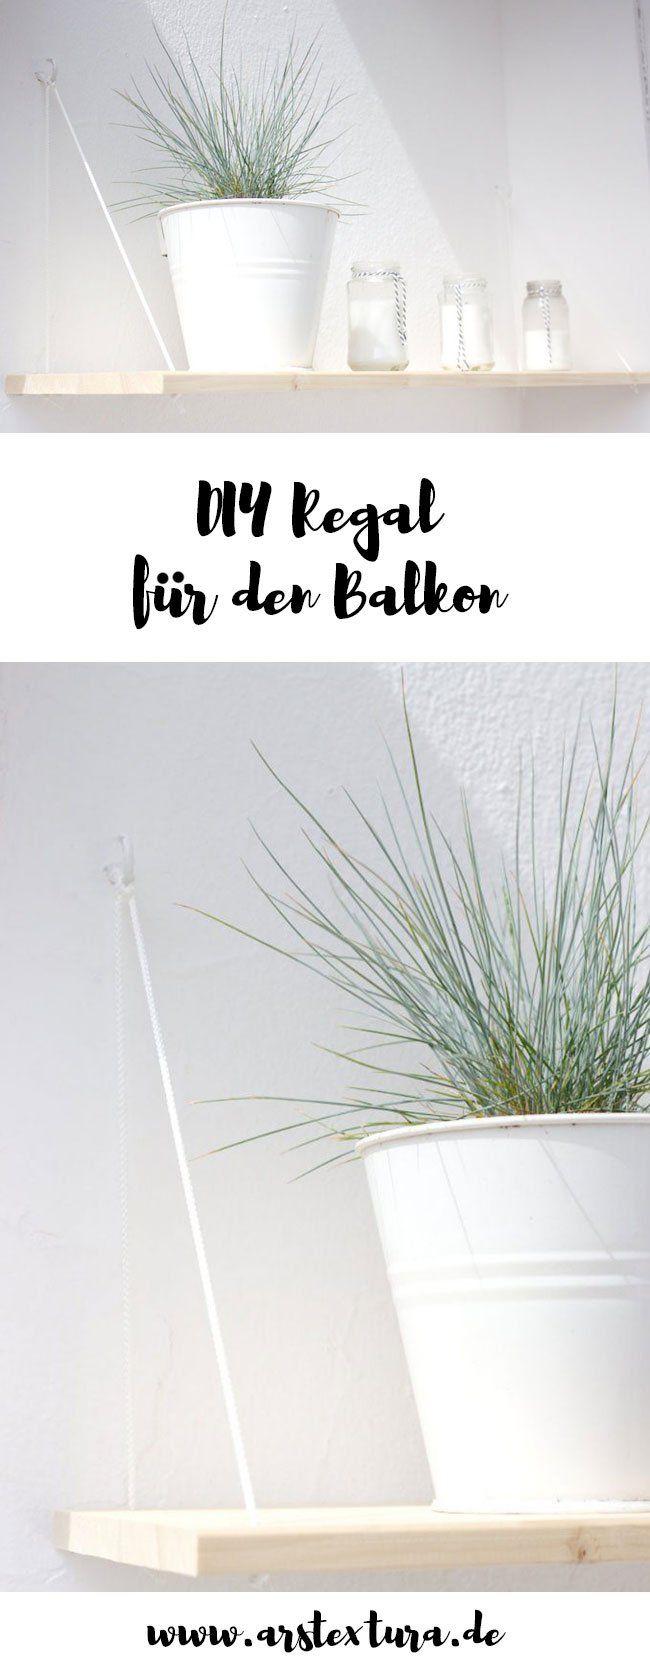 DIY Hängeregal Für Den Balkon